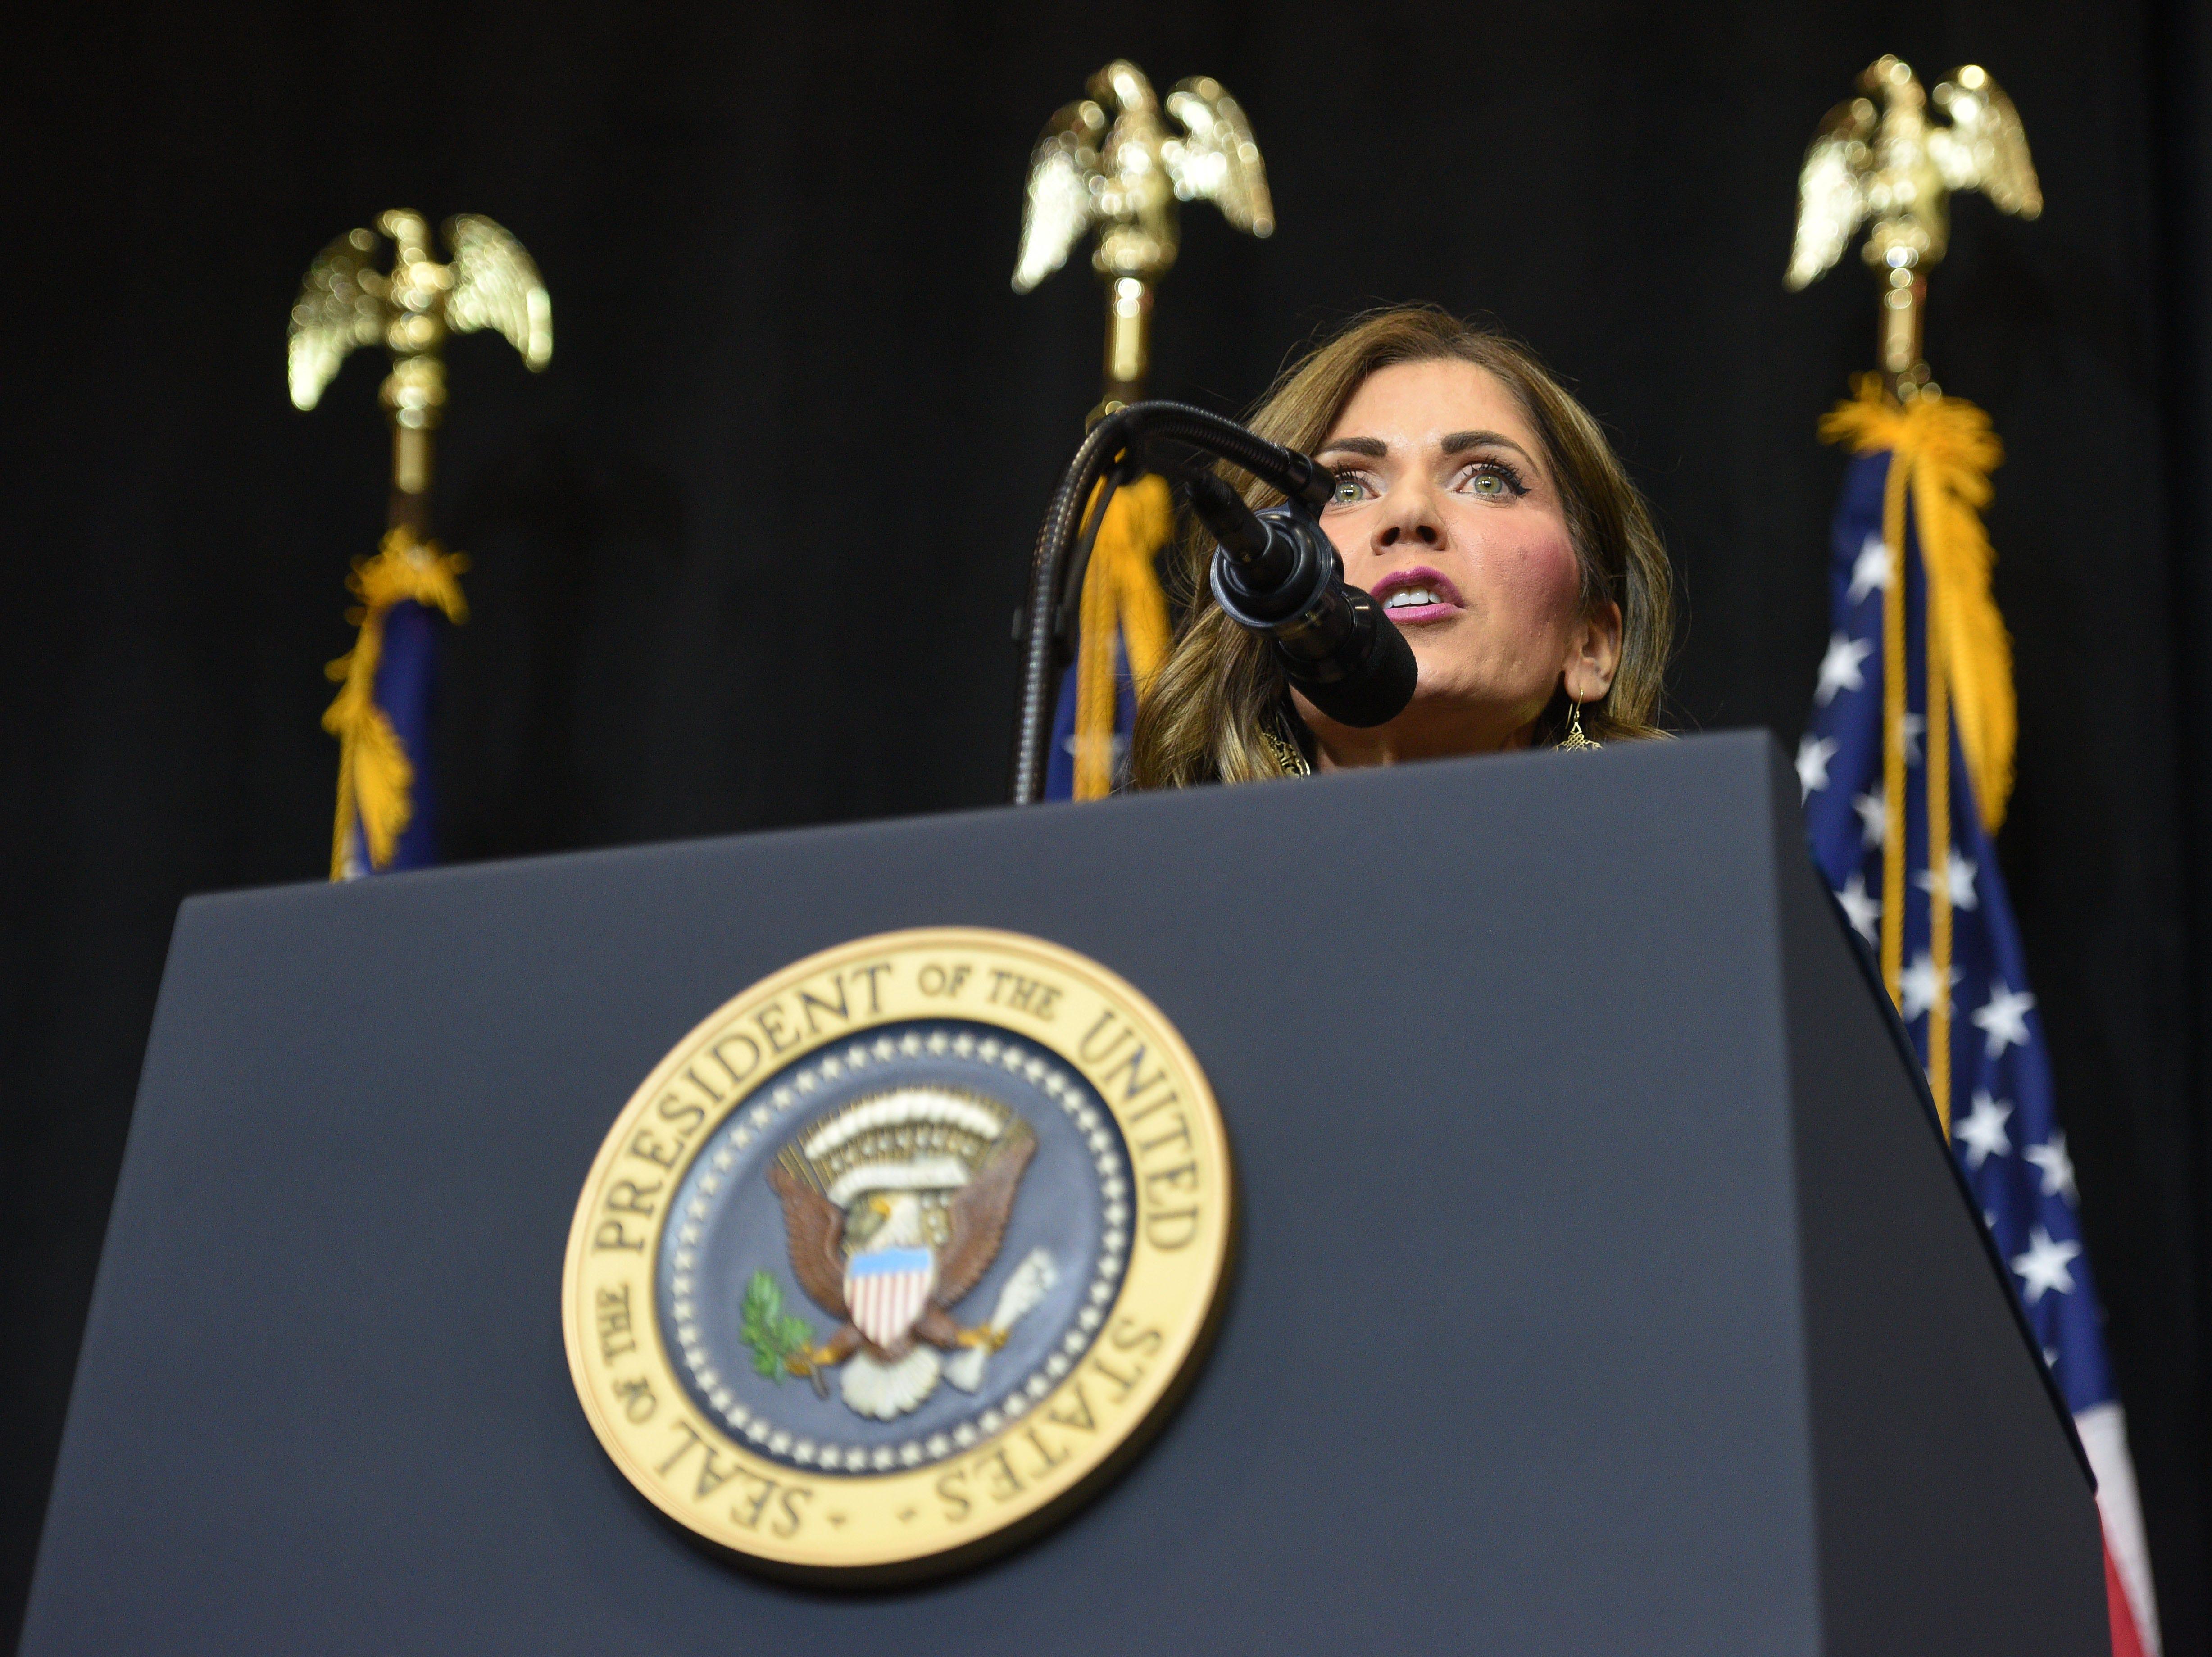 U.S. Representative Kristi Noem introduces President Donald Trump Friday, Sept. 7, at the Denny Sanford Premier Center in Sioux Falls.